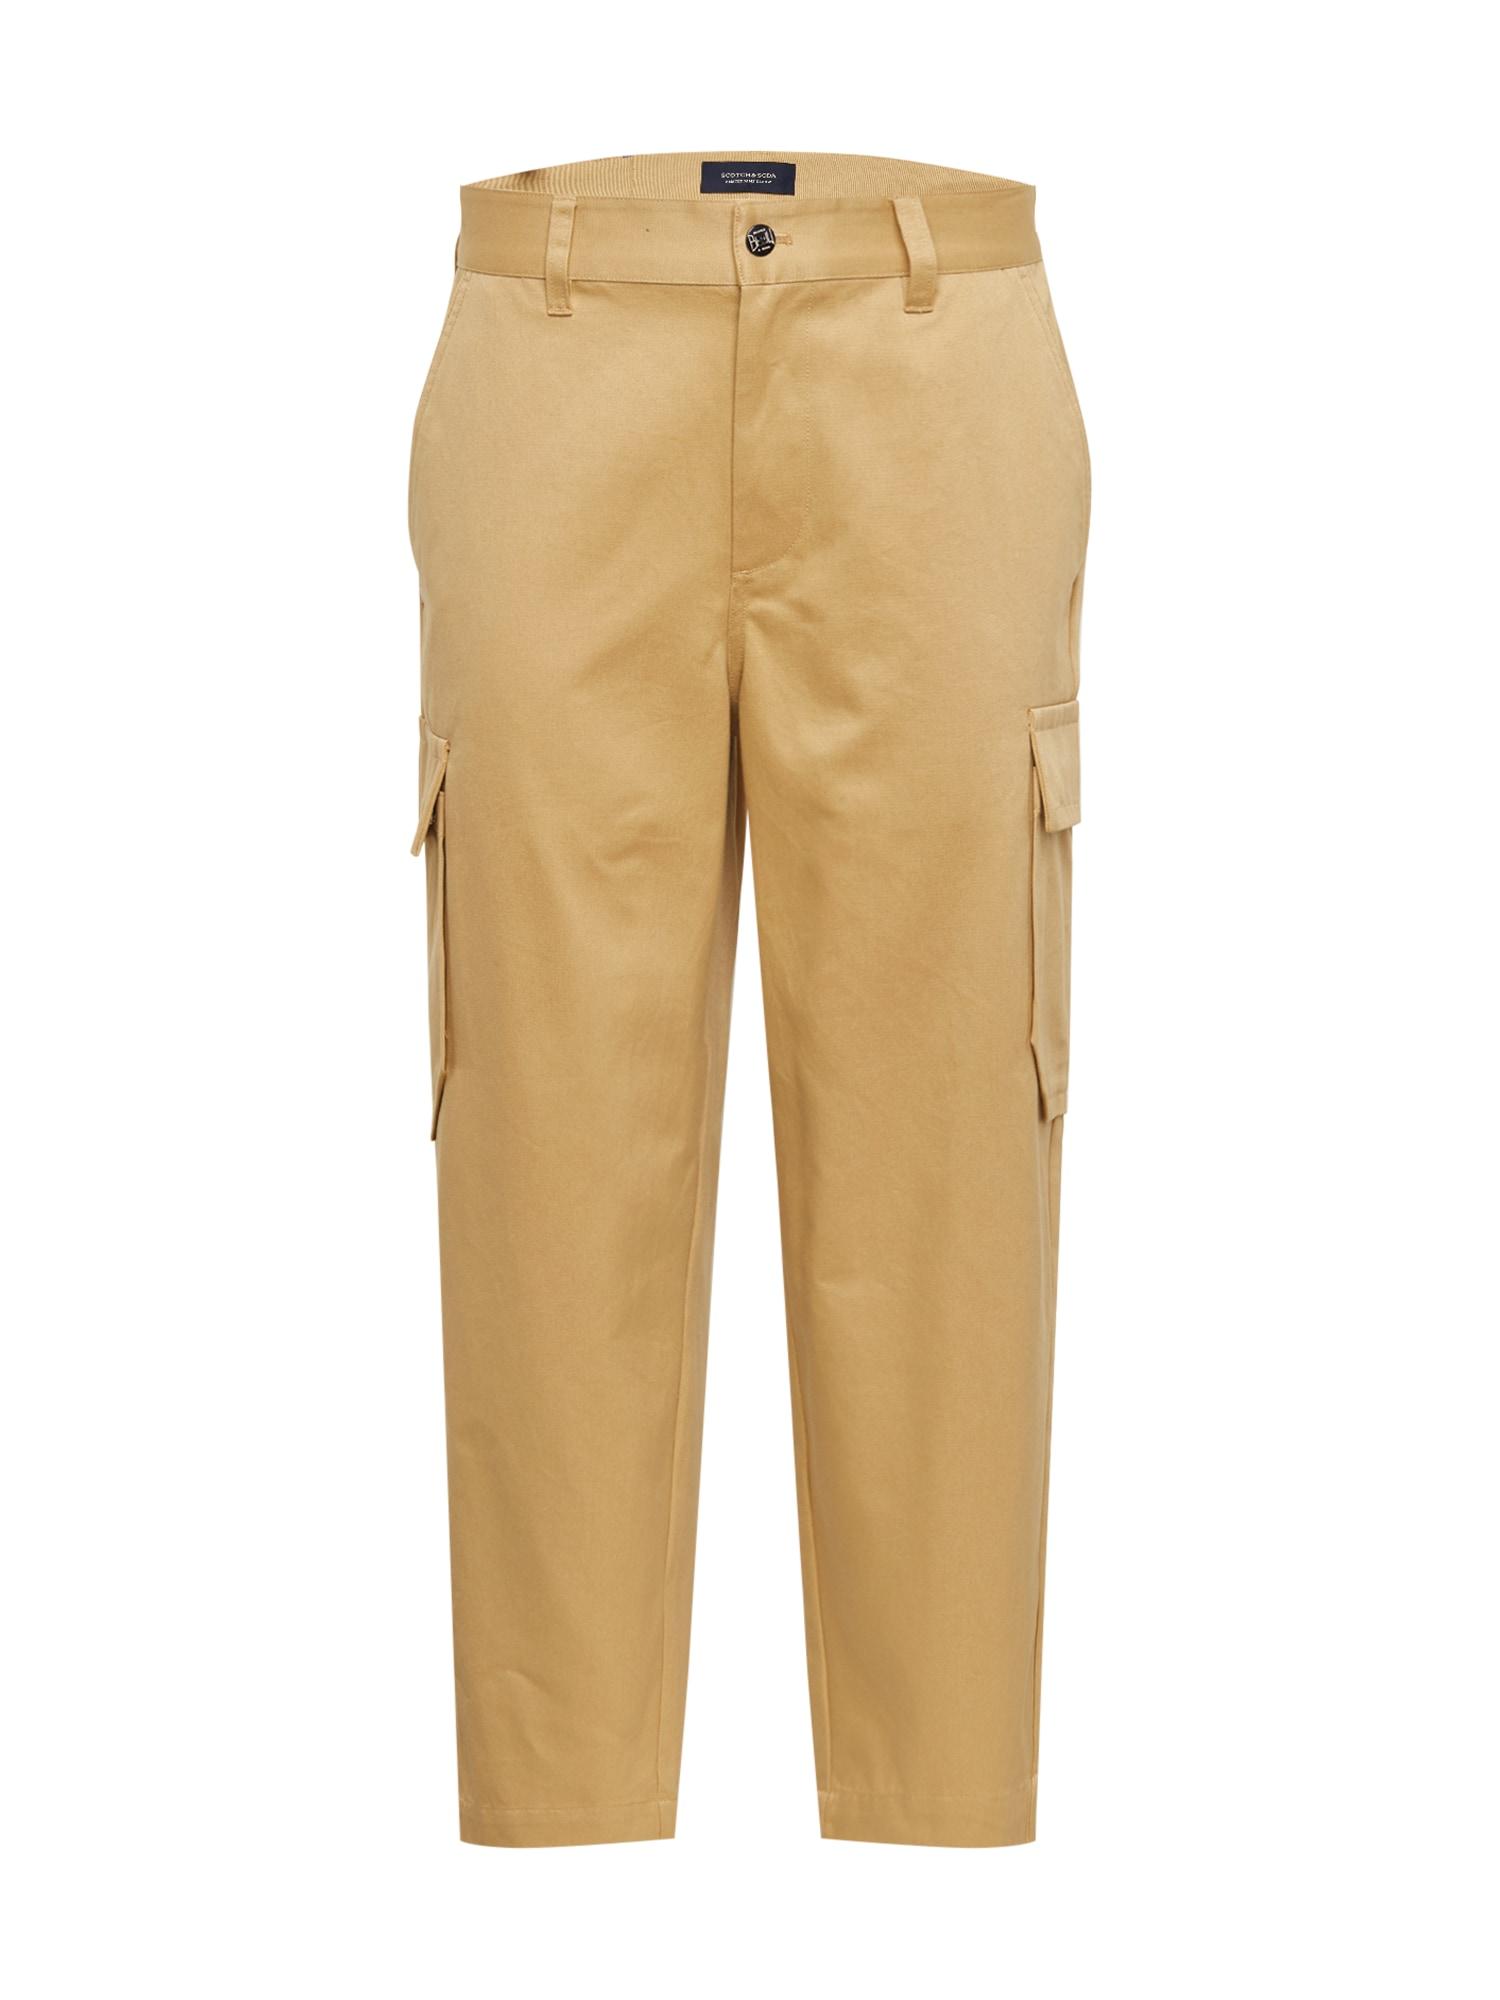 SCOTCH & SODA Laisvo stiliaus kelnės